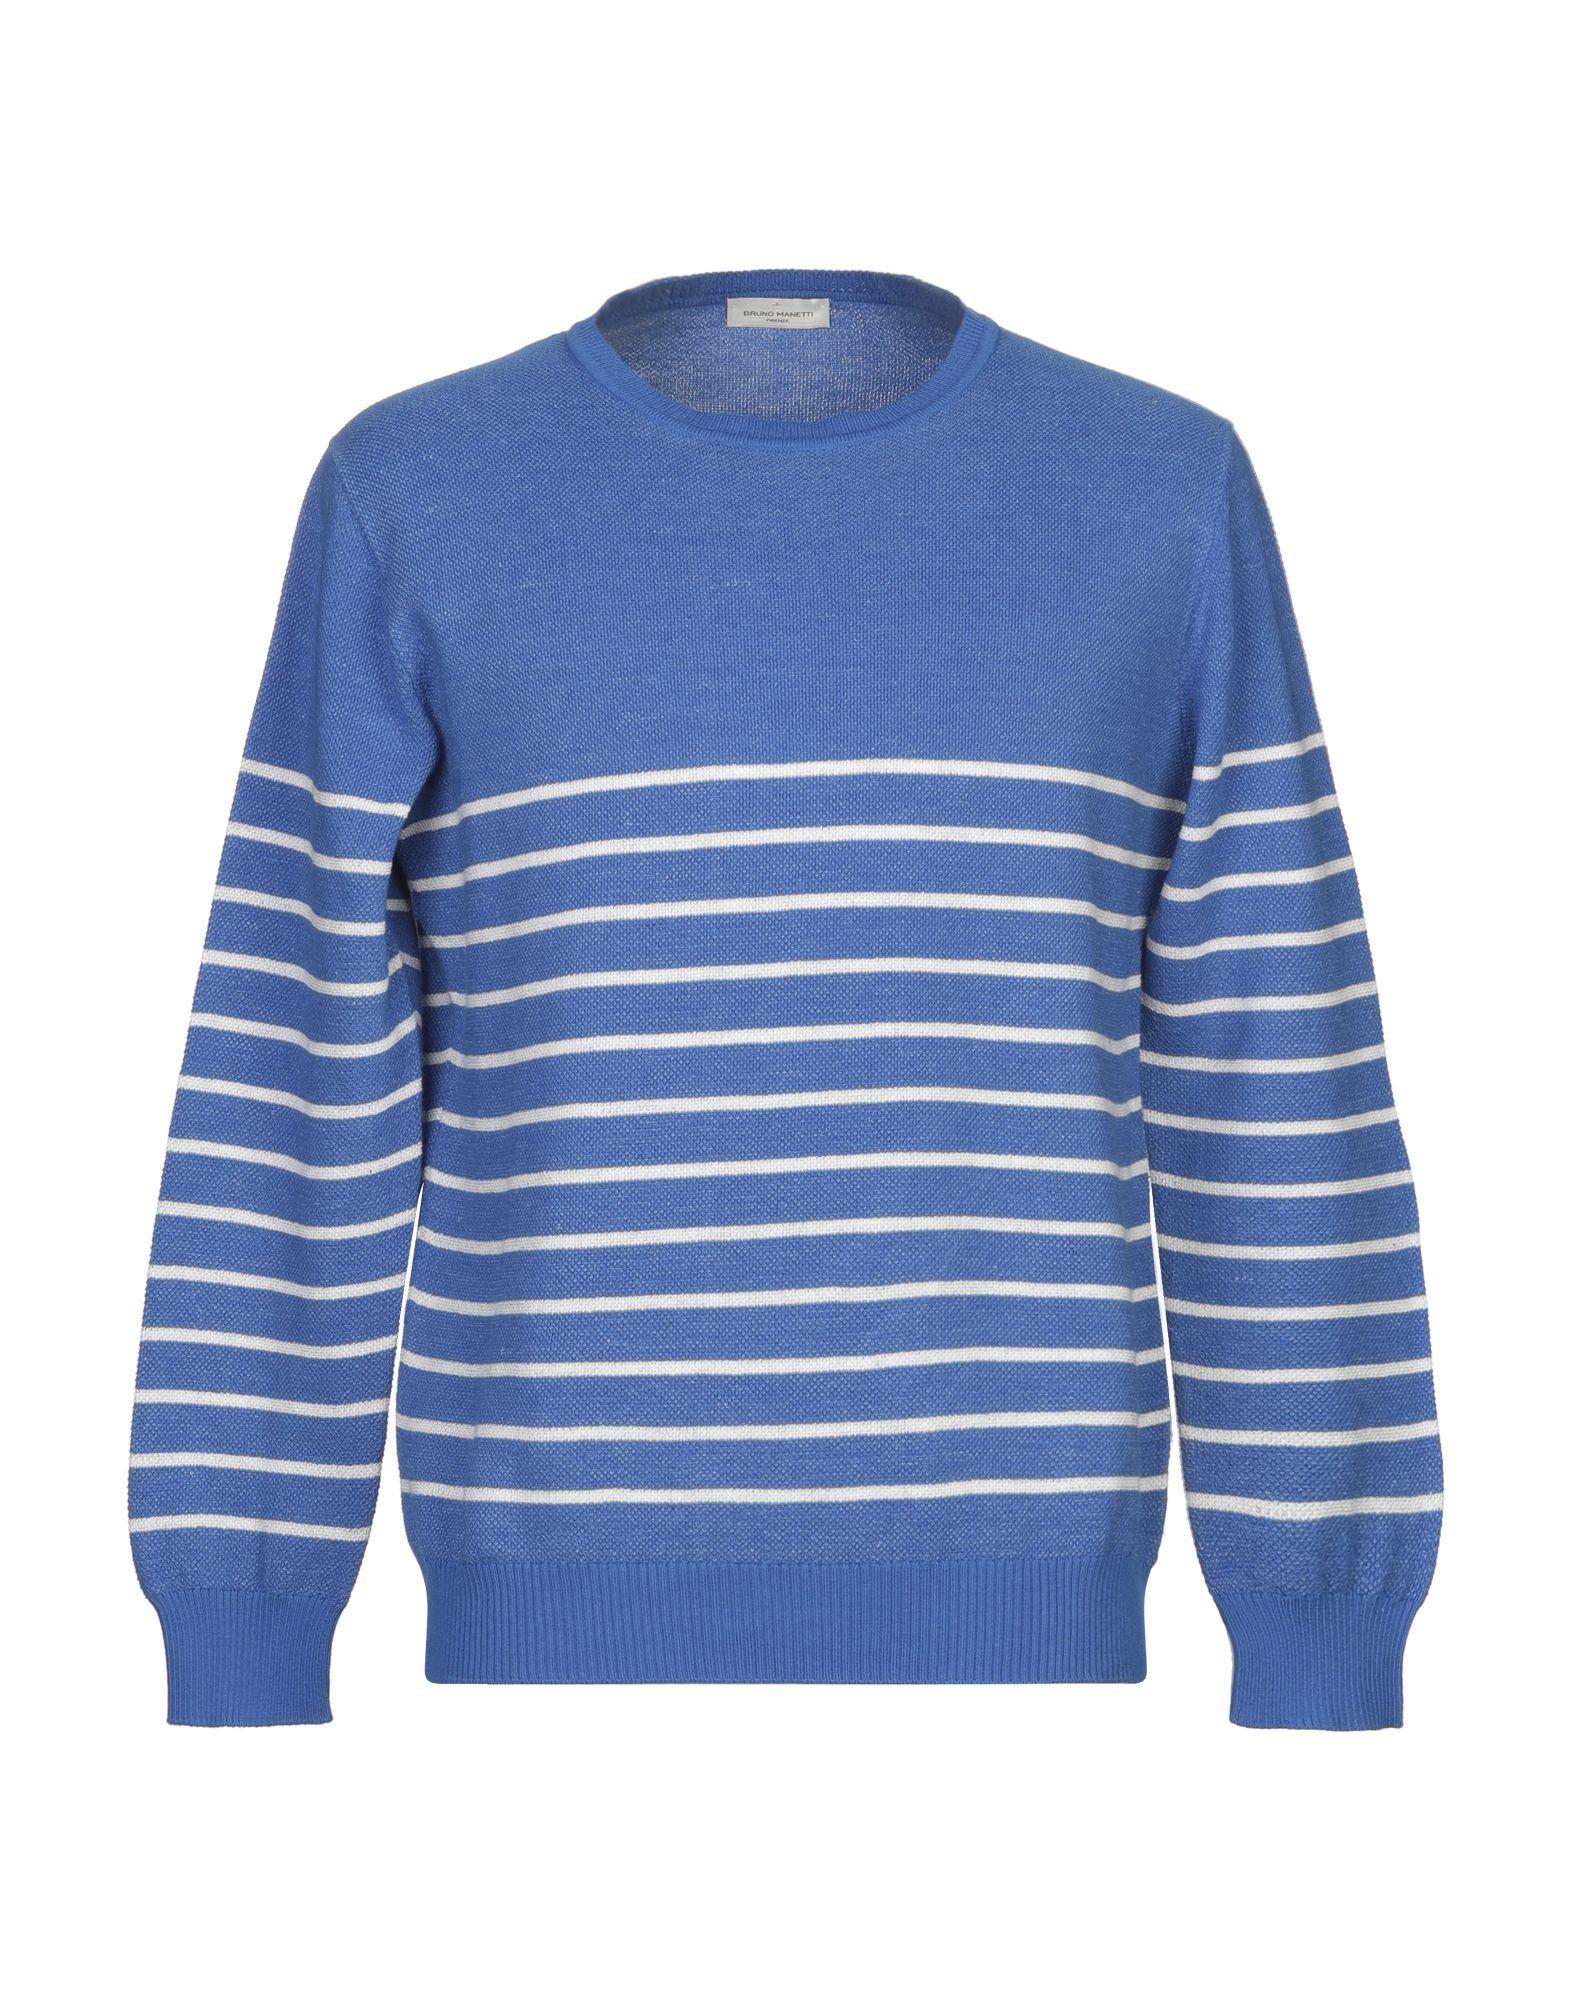 Bruno Manetti - Knitwear - Jumpers - On Yoox.com